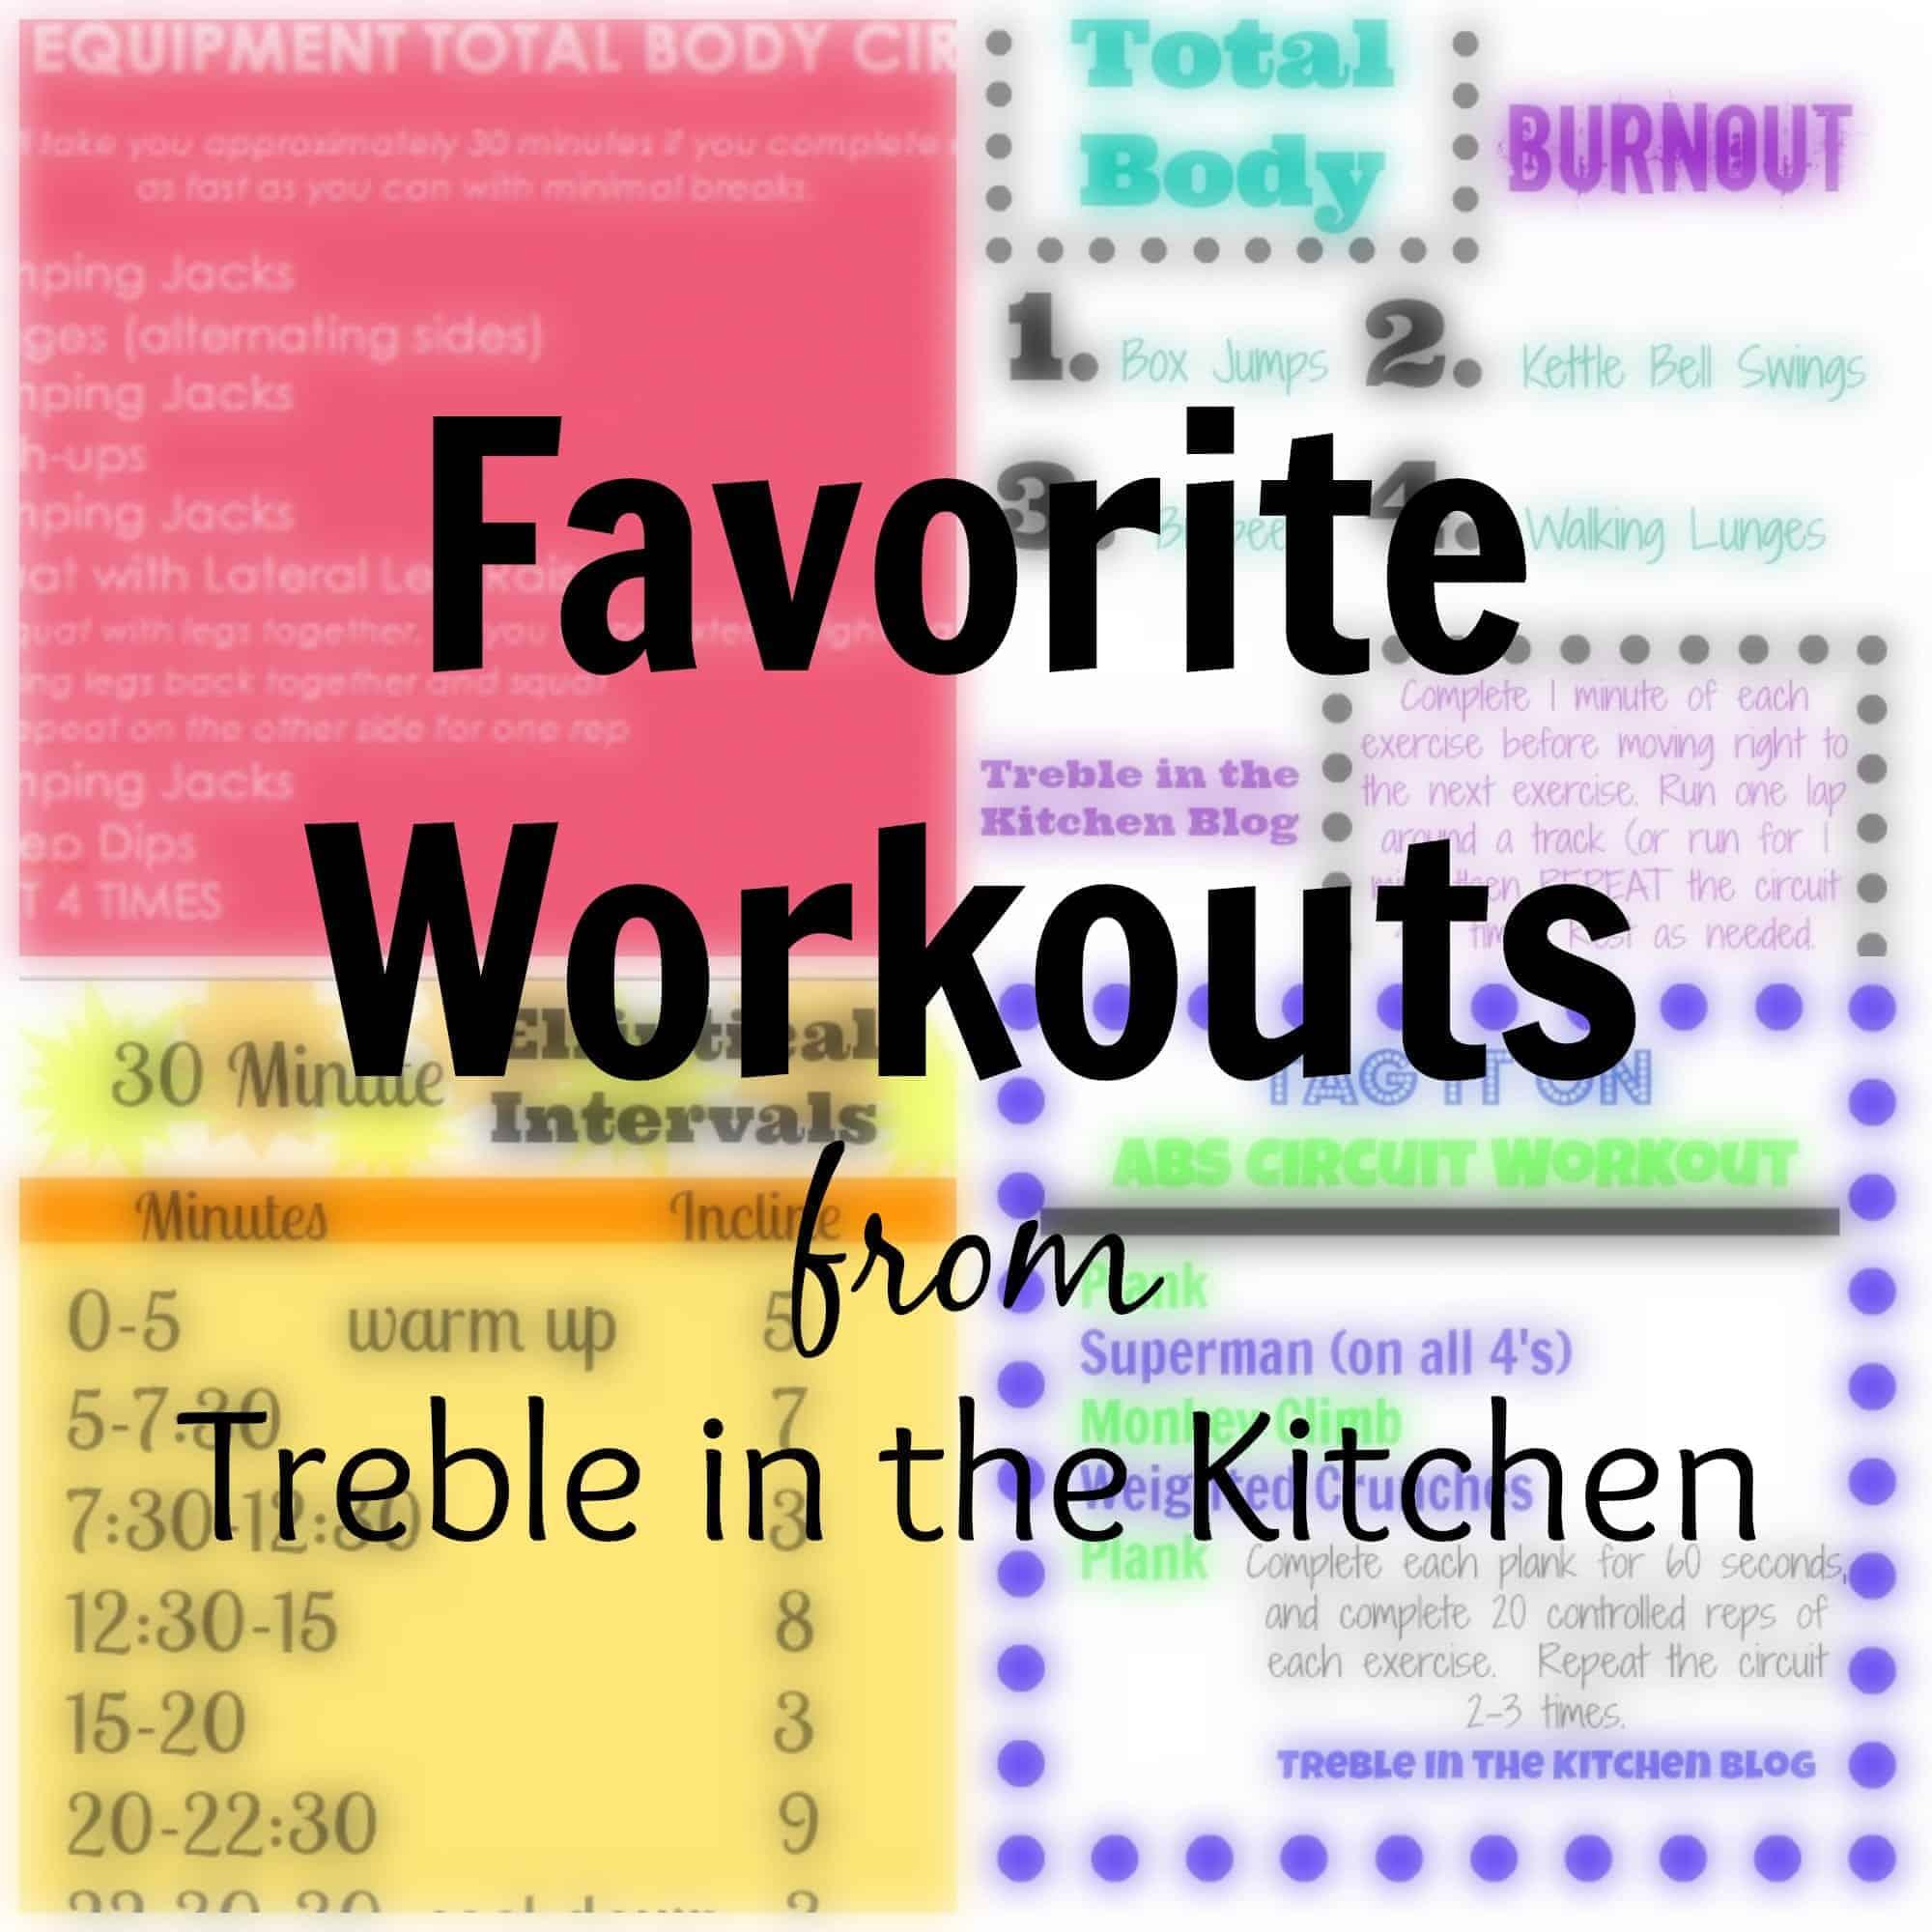 Workout Roundup via Treble in the Kitchen